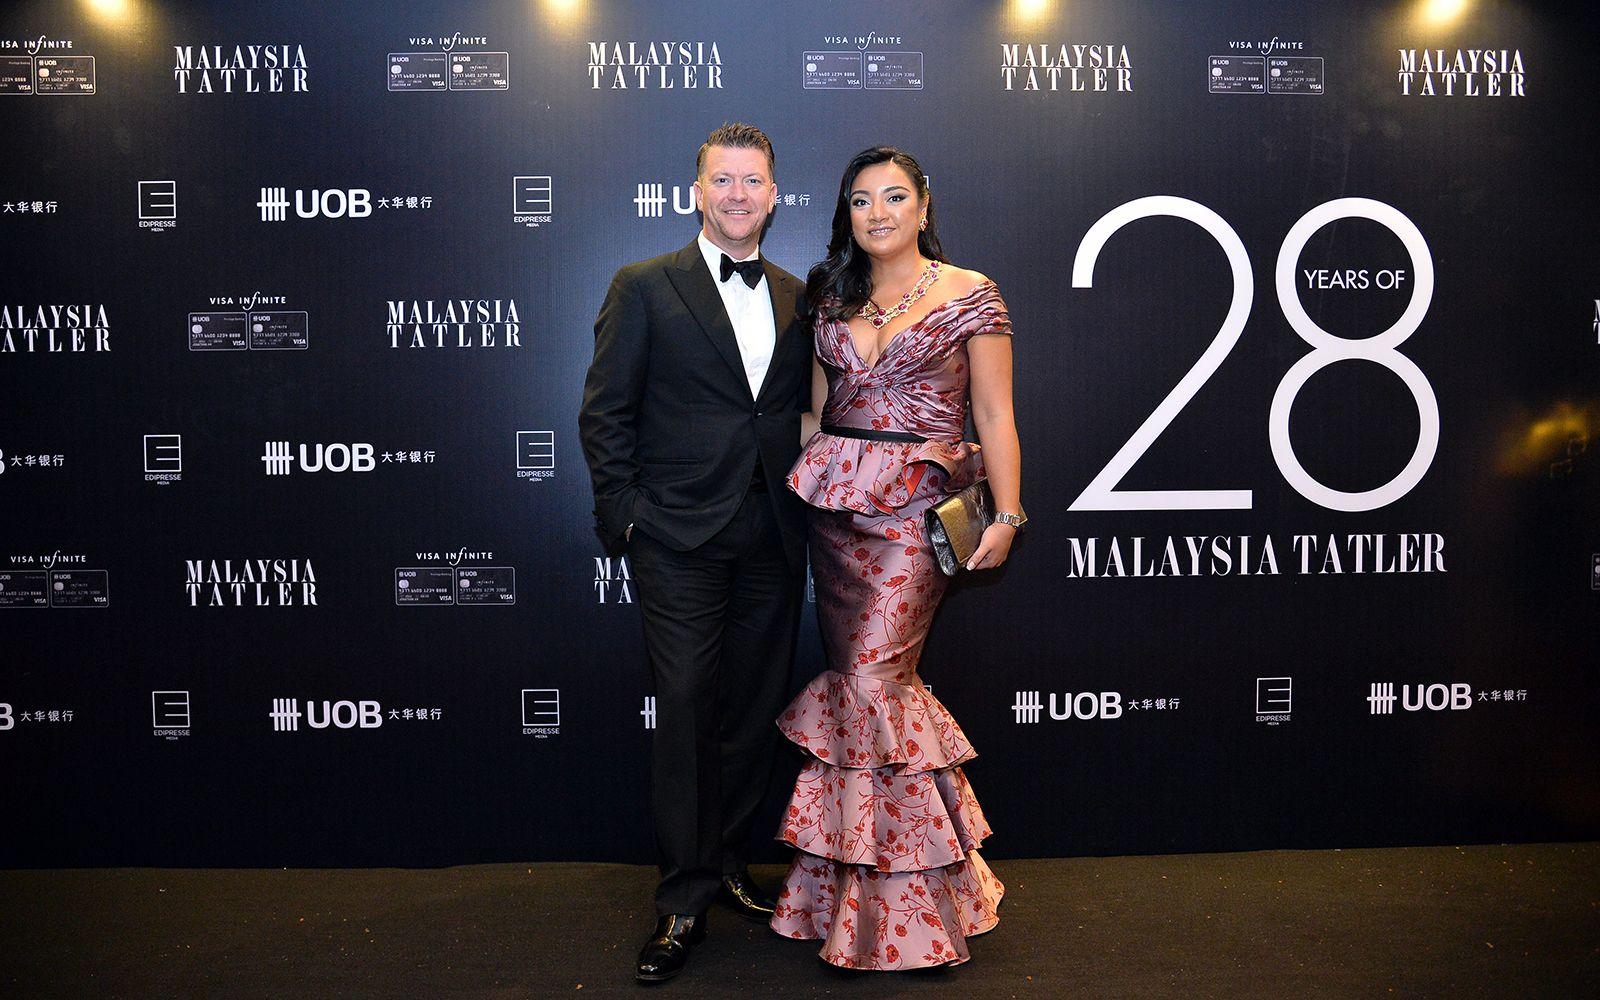 Dato' James Greaves and Tunku Datin Myra Madihah in Johanna Ortiz